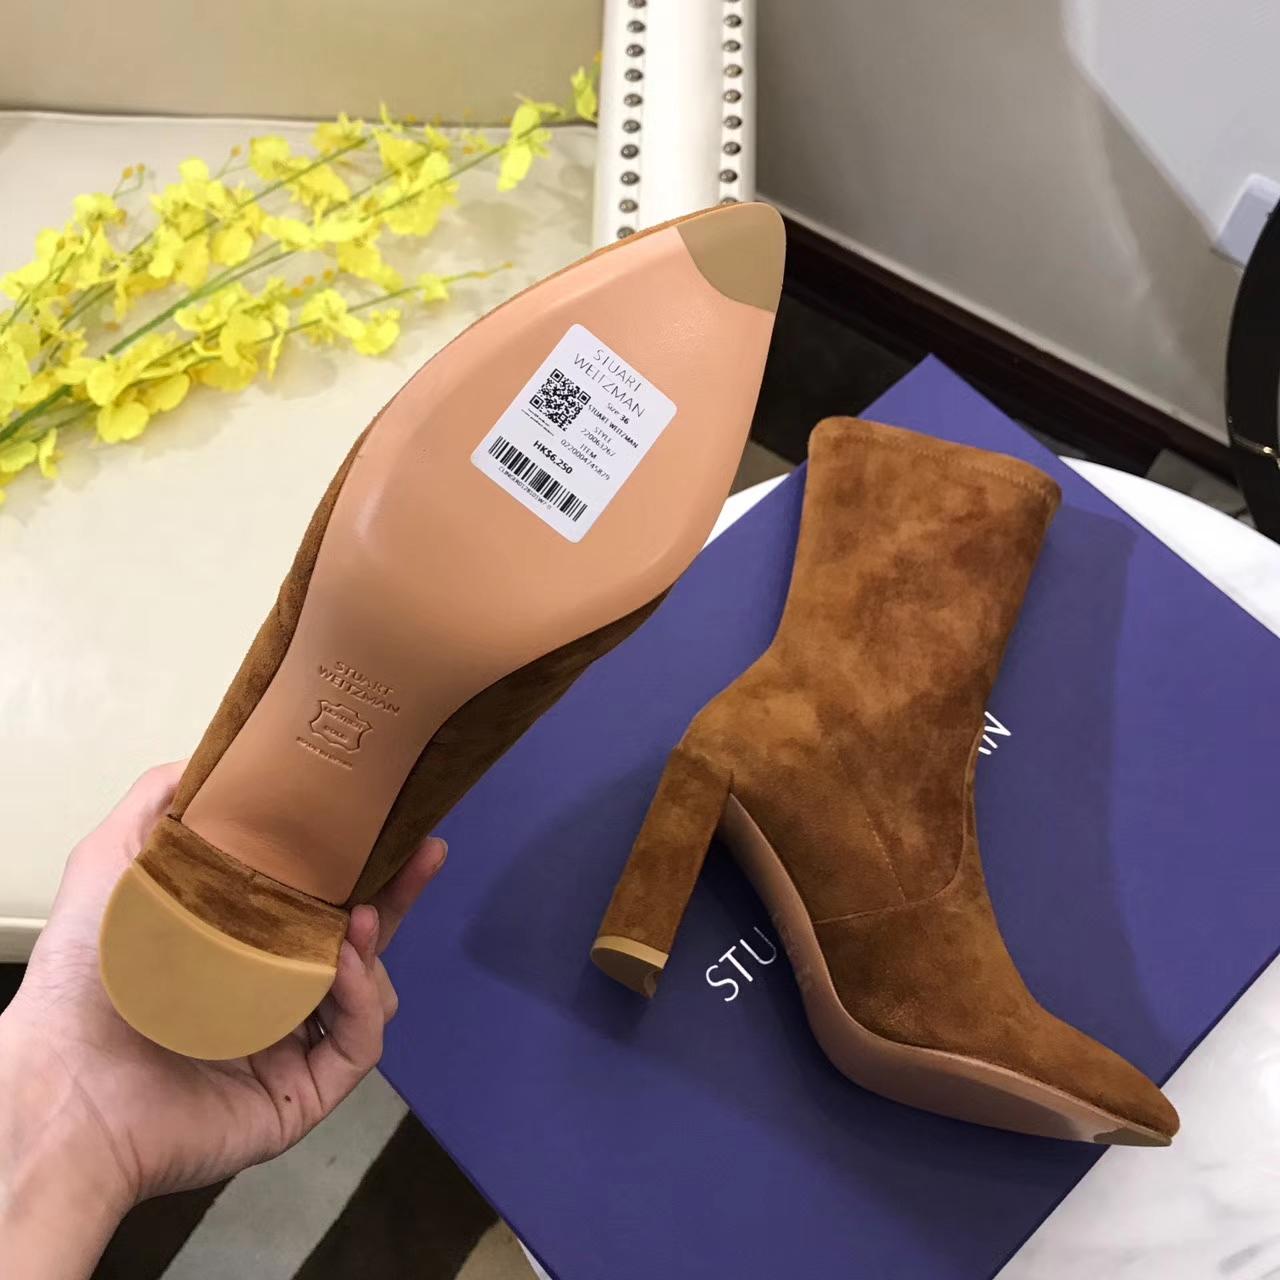 Stuart Weitzman短靴 SW尖头短靴原单代购货源